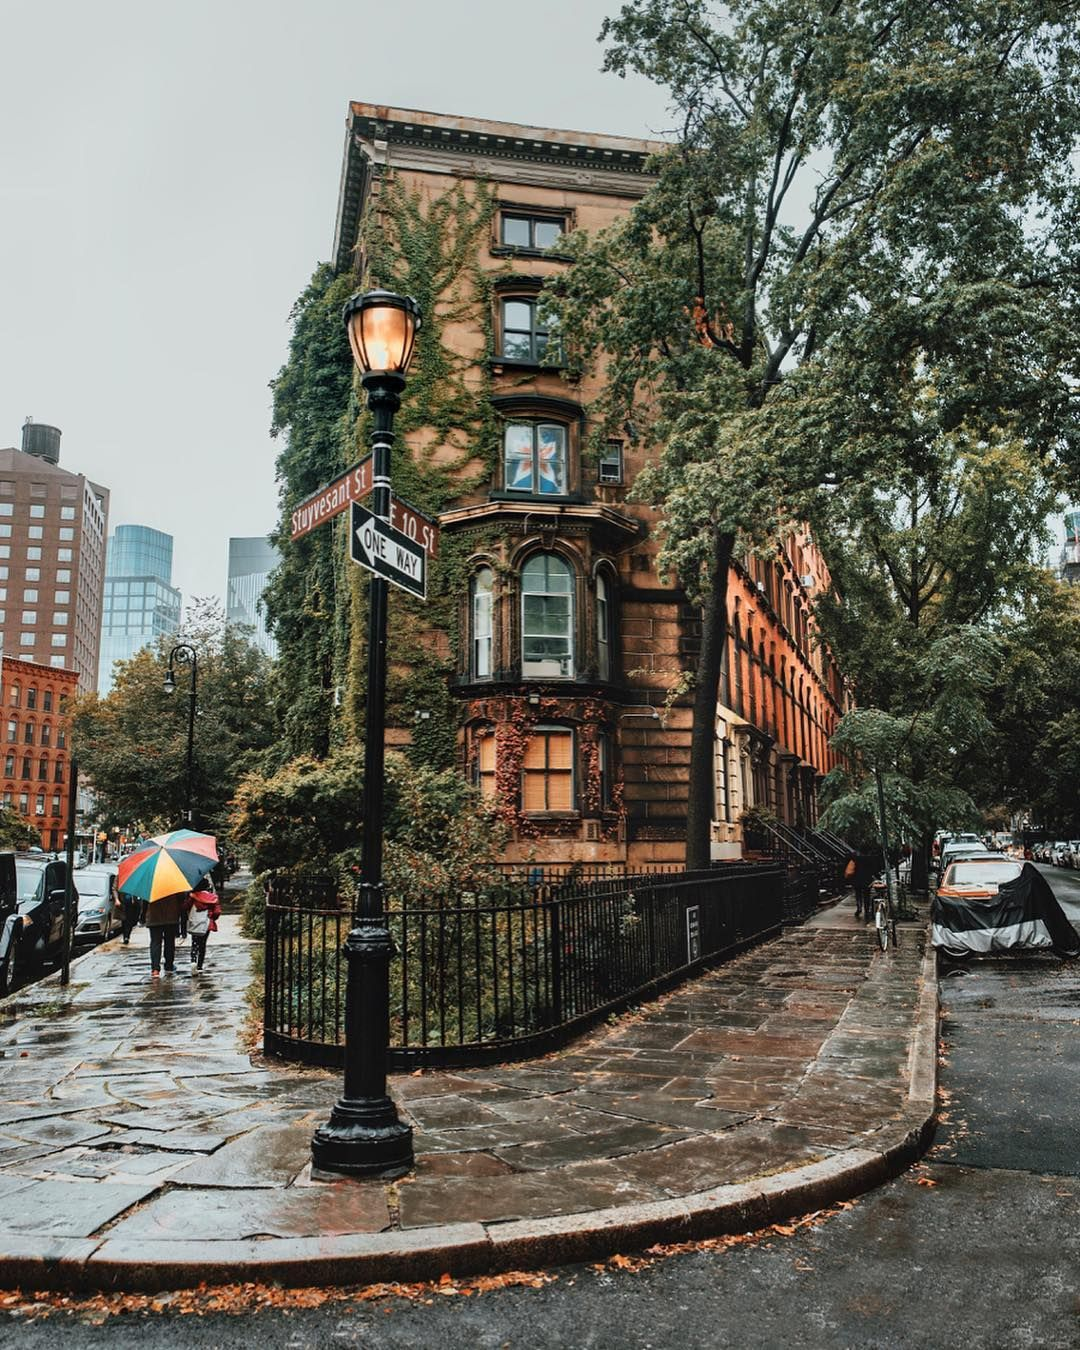 New York City Apartment Streets: Spectacular Street Photos Of New York City By Joe Thomas